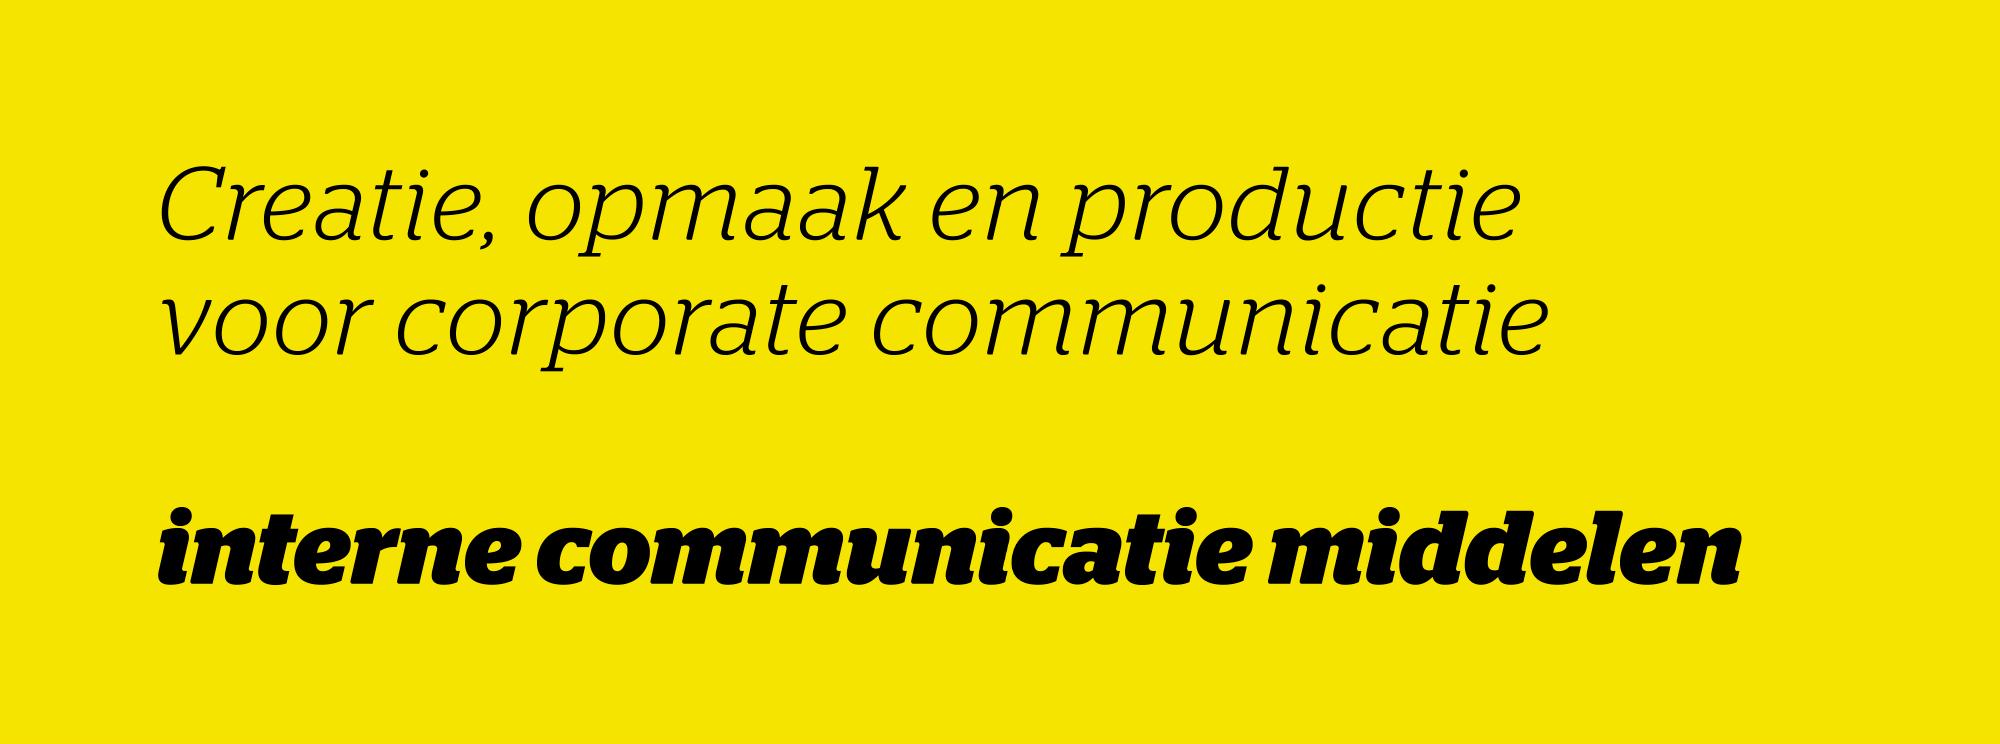 interne communicatie middelen